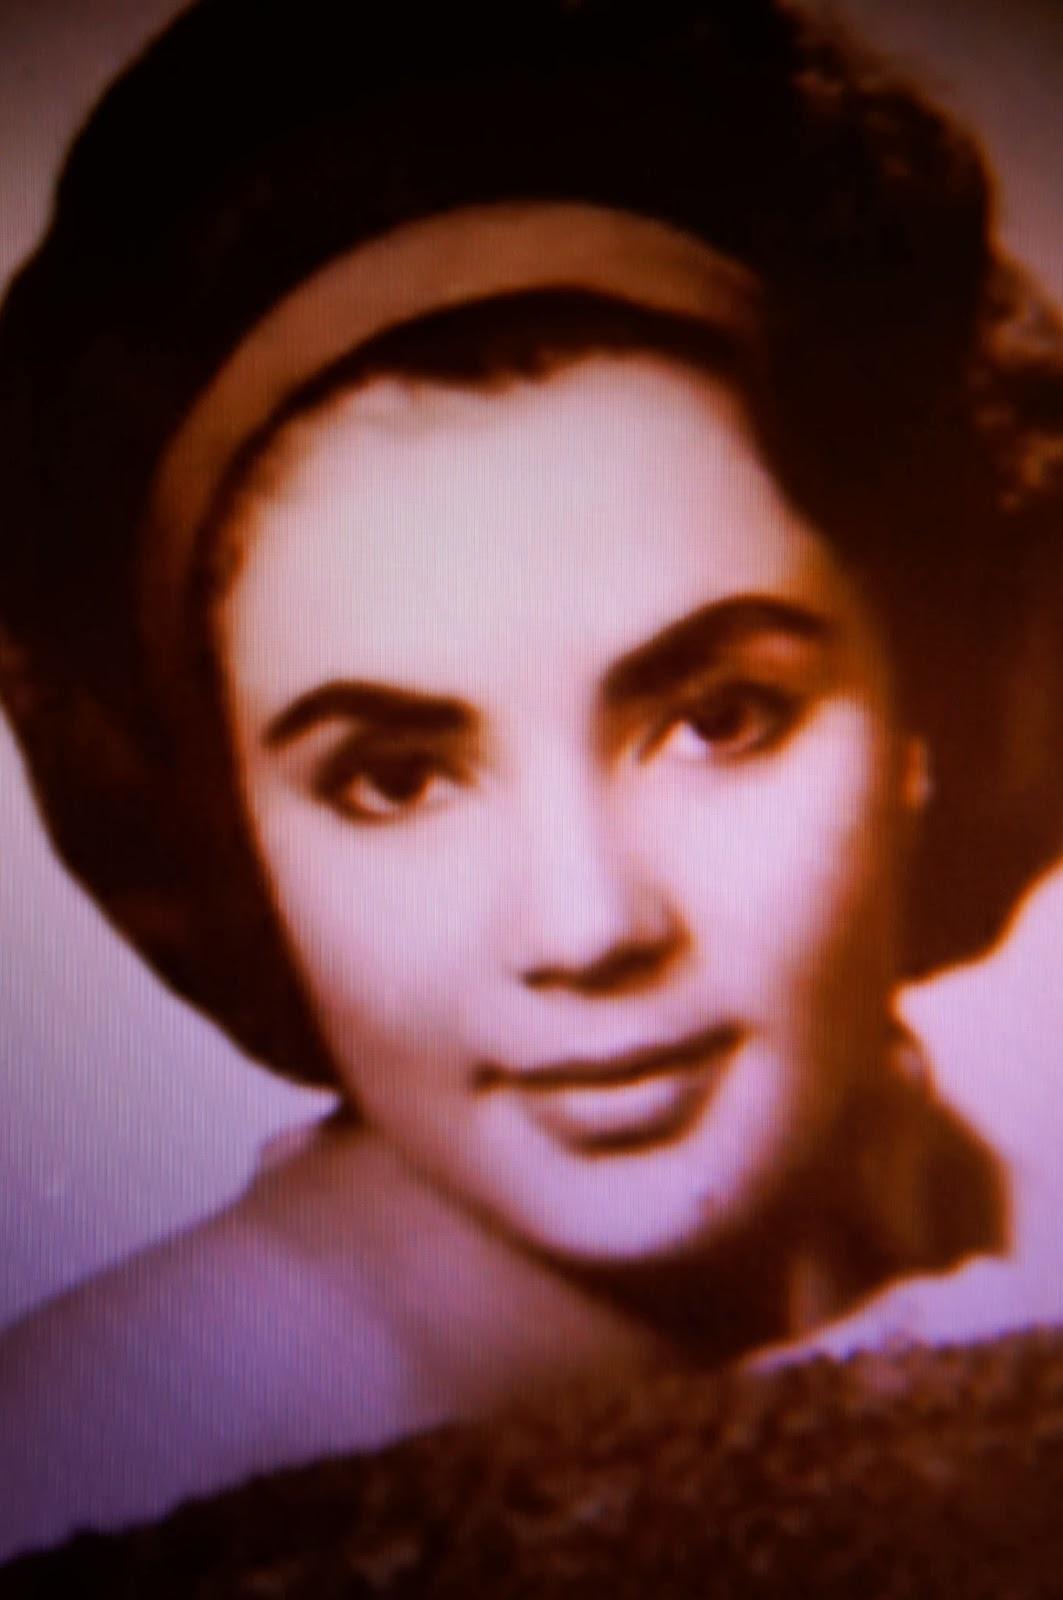 Amalia Fuentes (b. 1940)